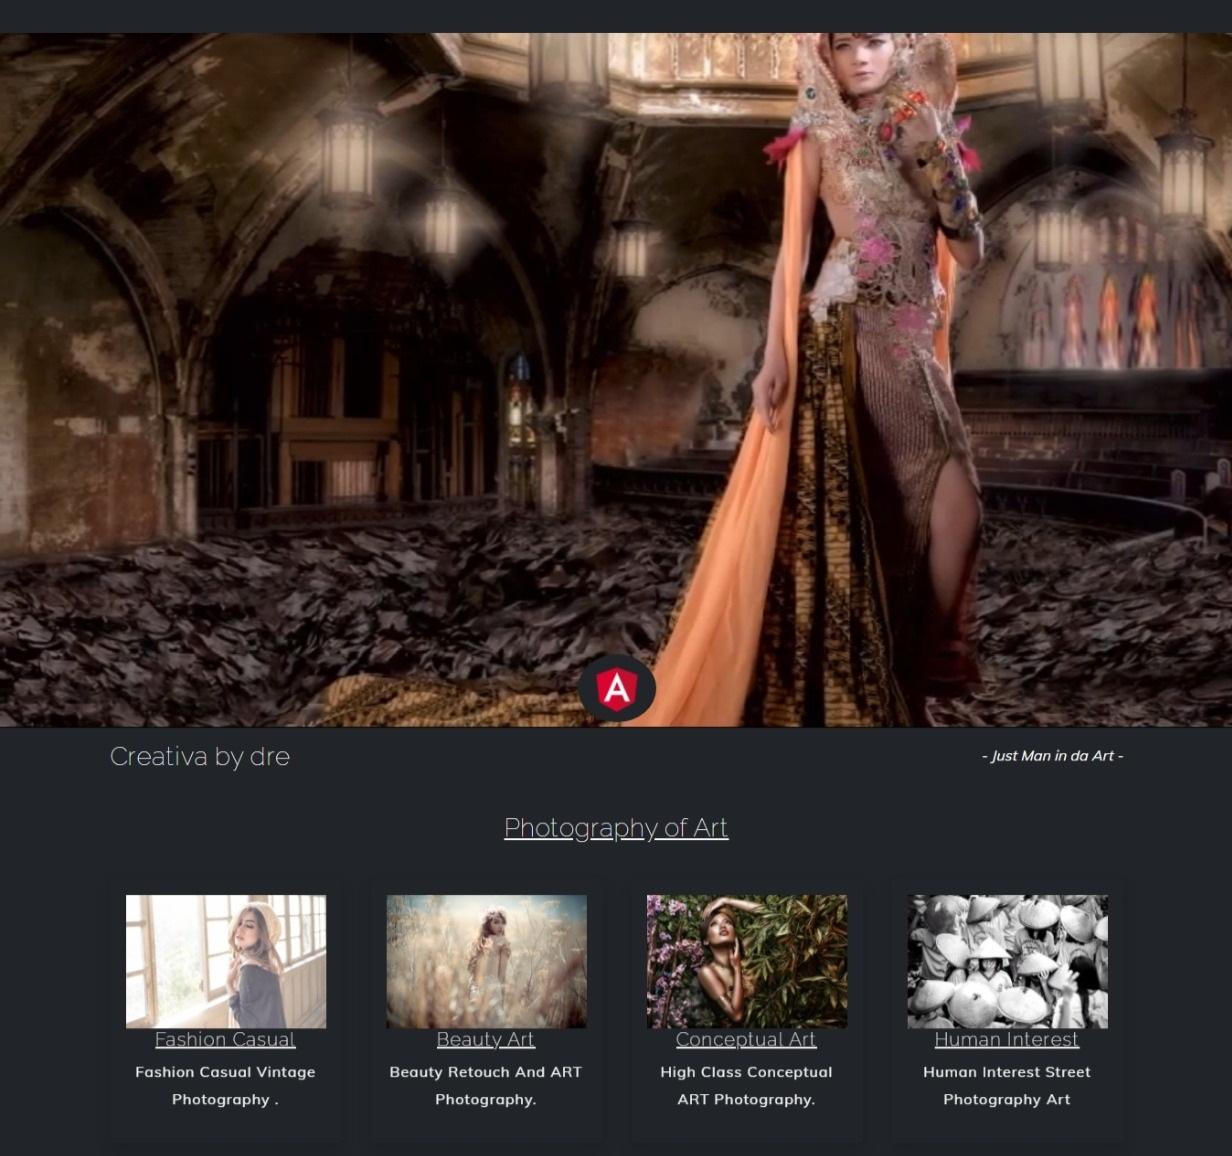 New Photographer photography Portfolio website template themes free download gratis